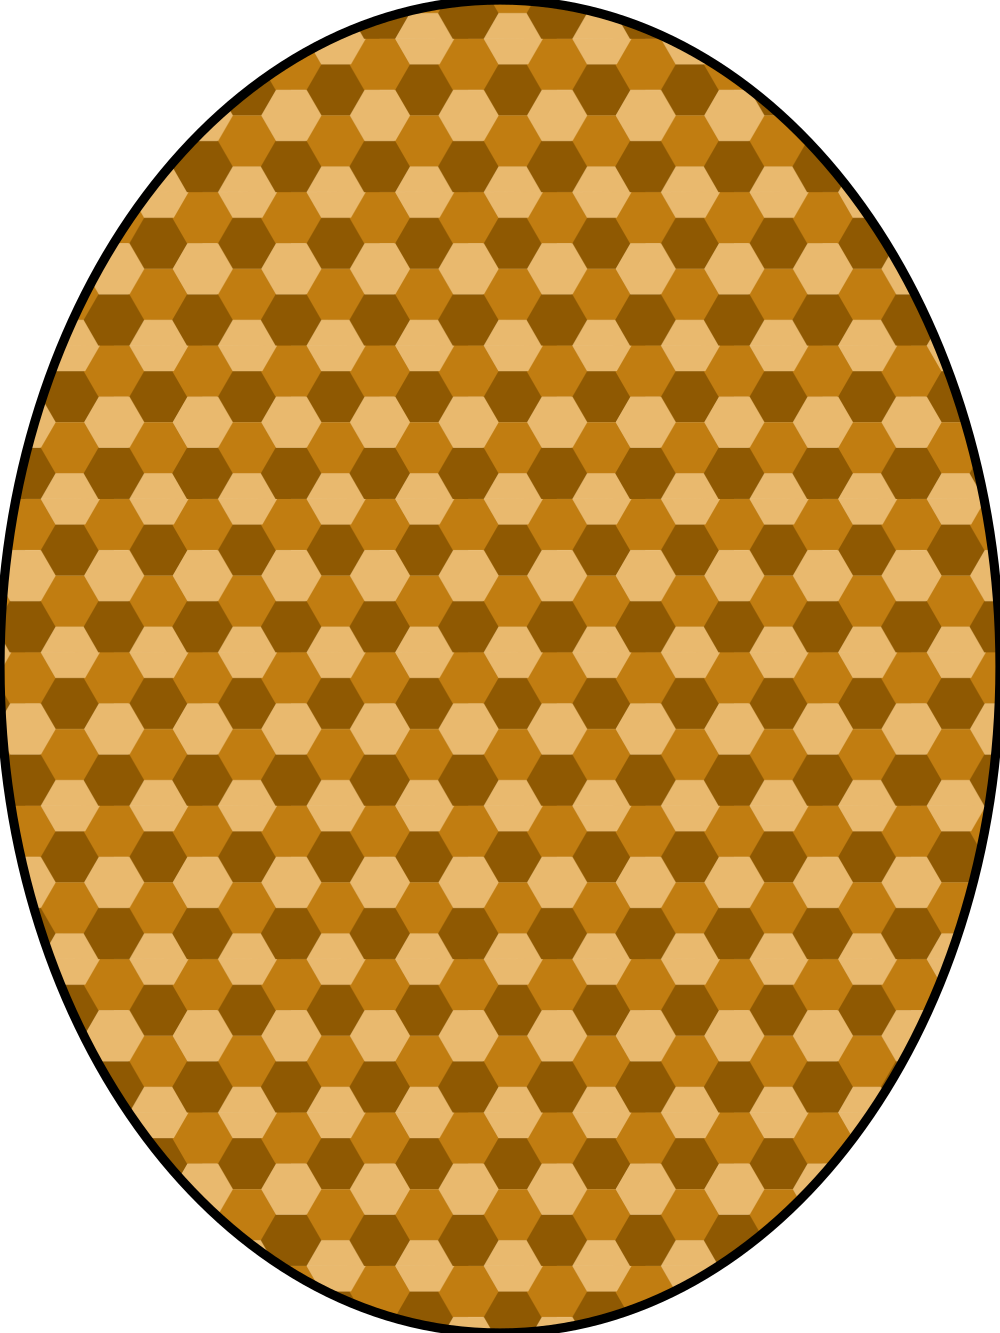 Onlinelabels clip art pattern. Honeycomb clipart honeycomb design